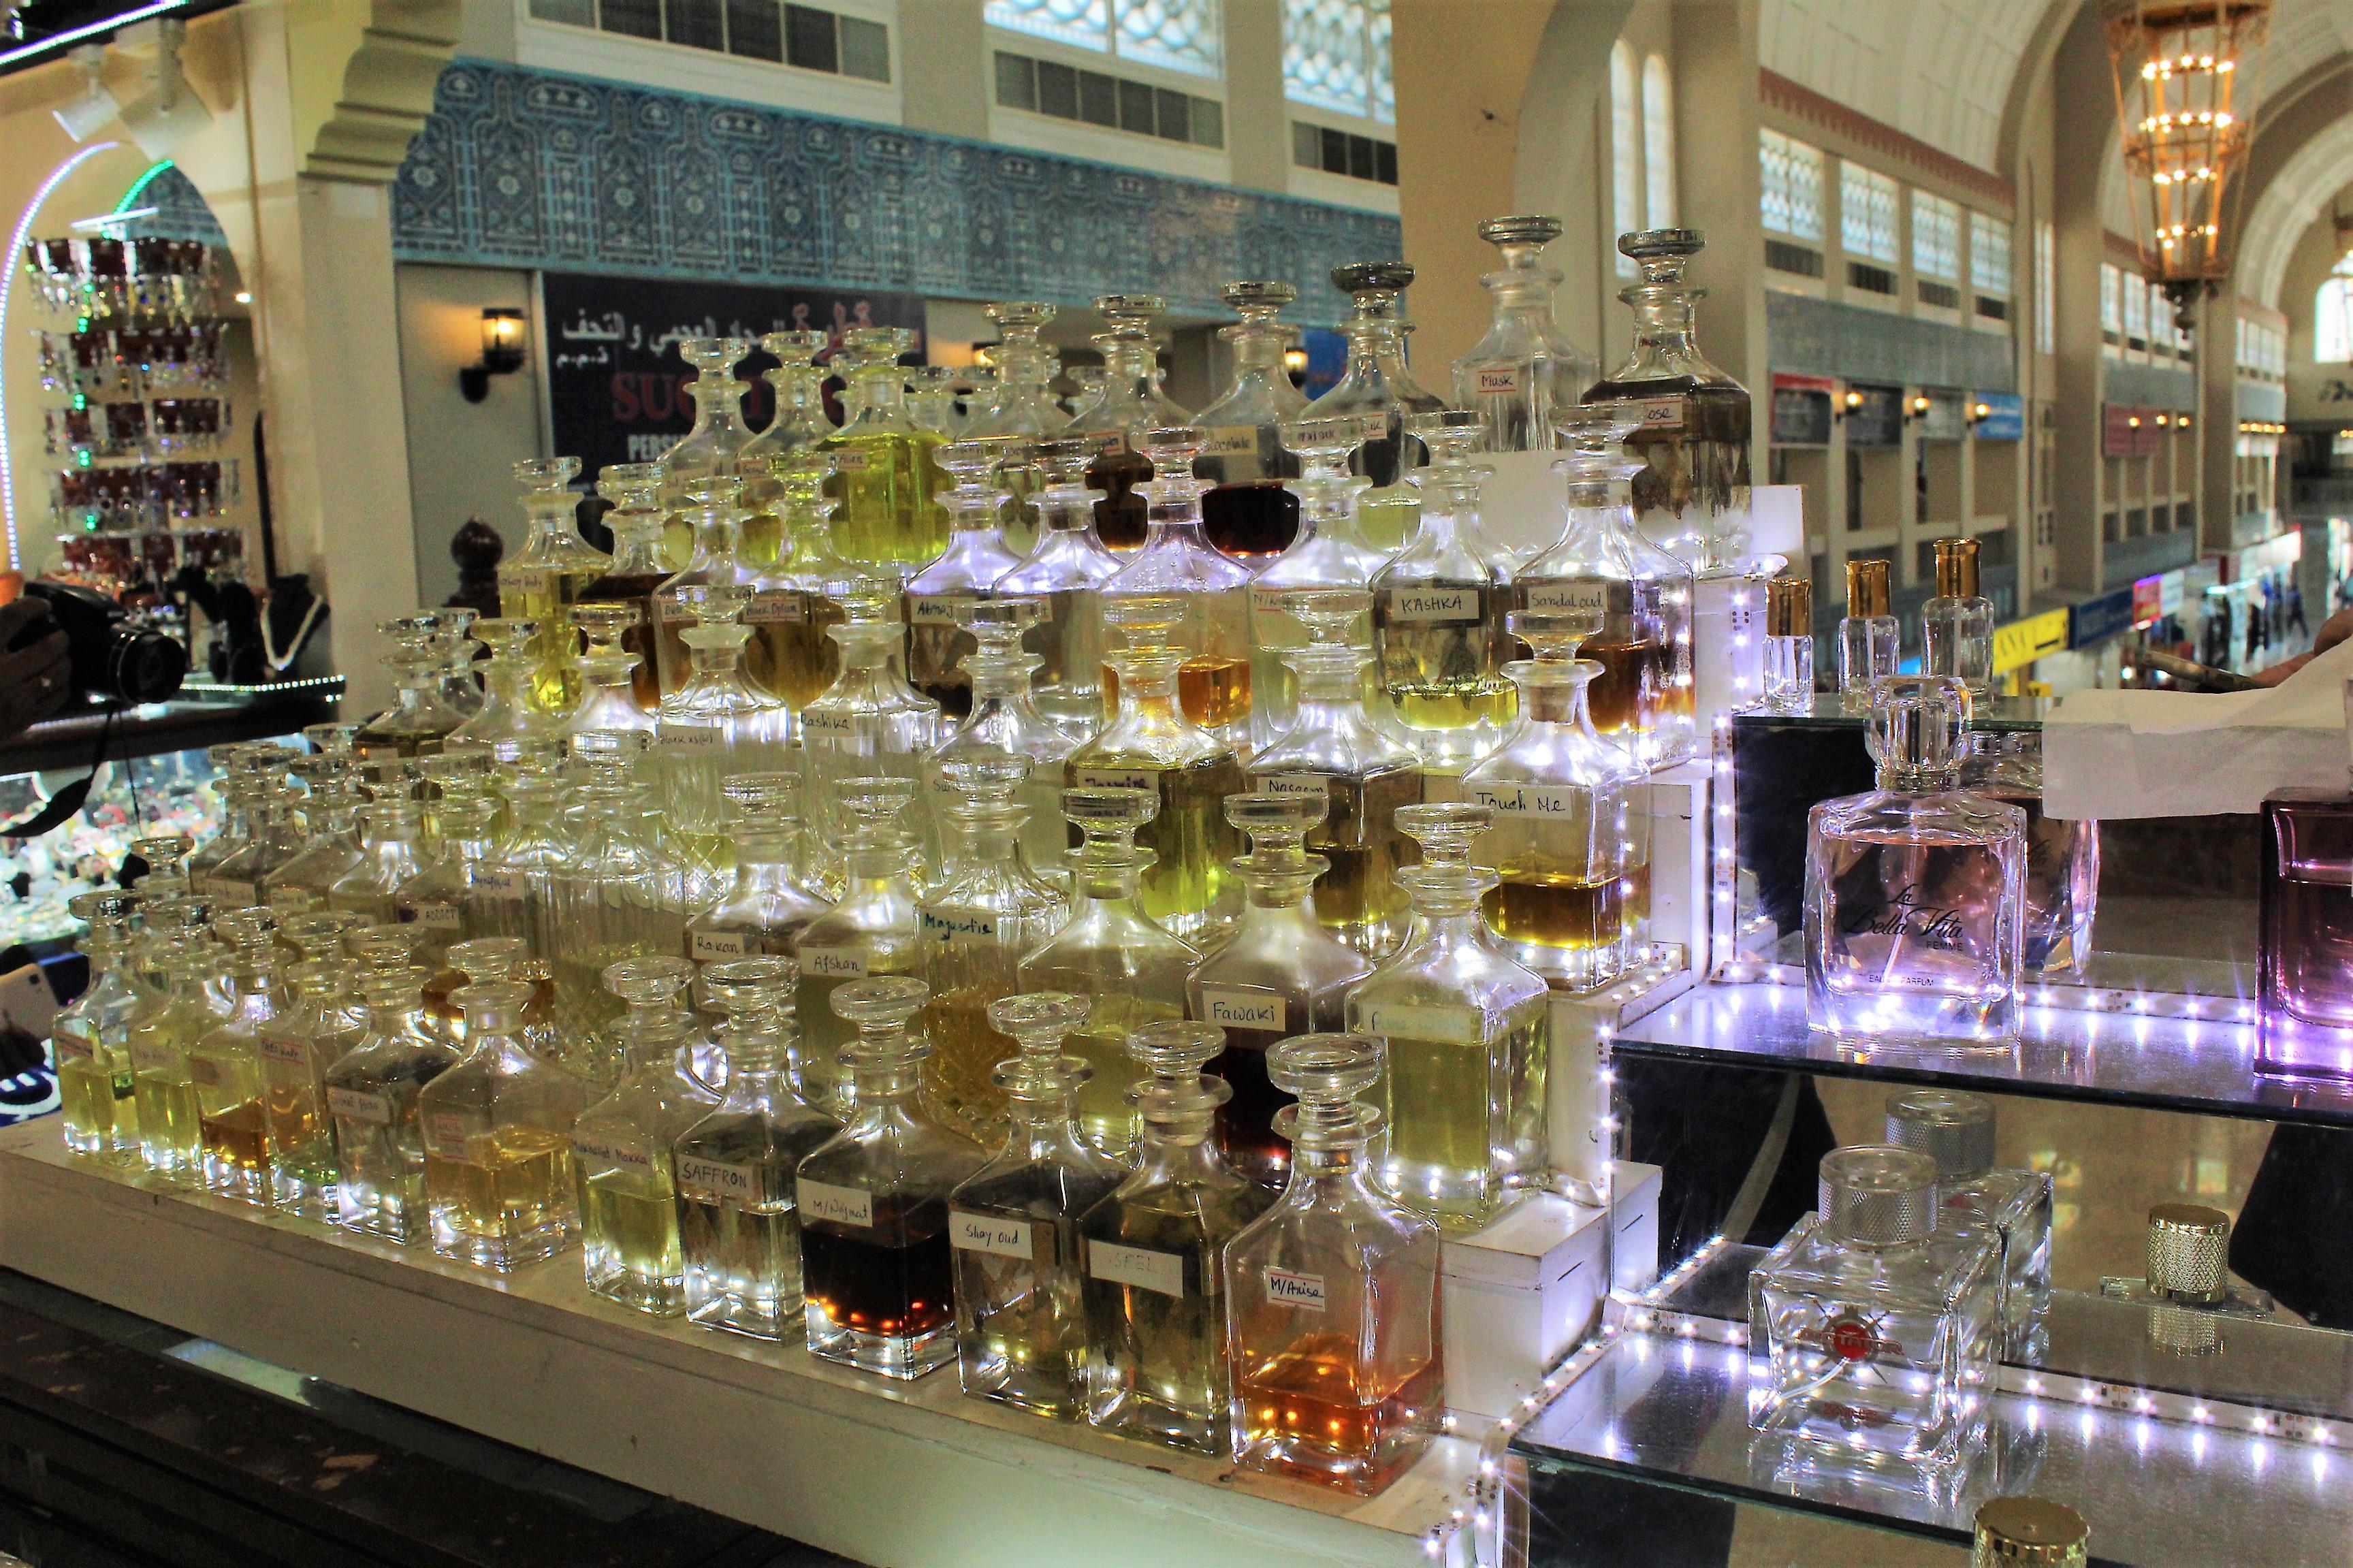 Ittar (oil based pefumes) of various notes